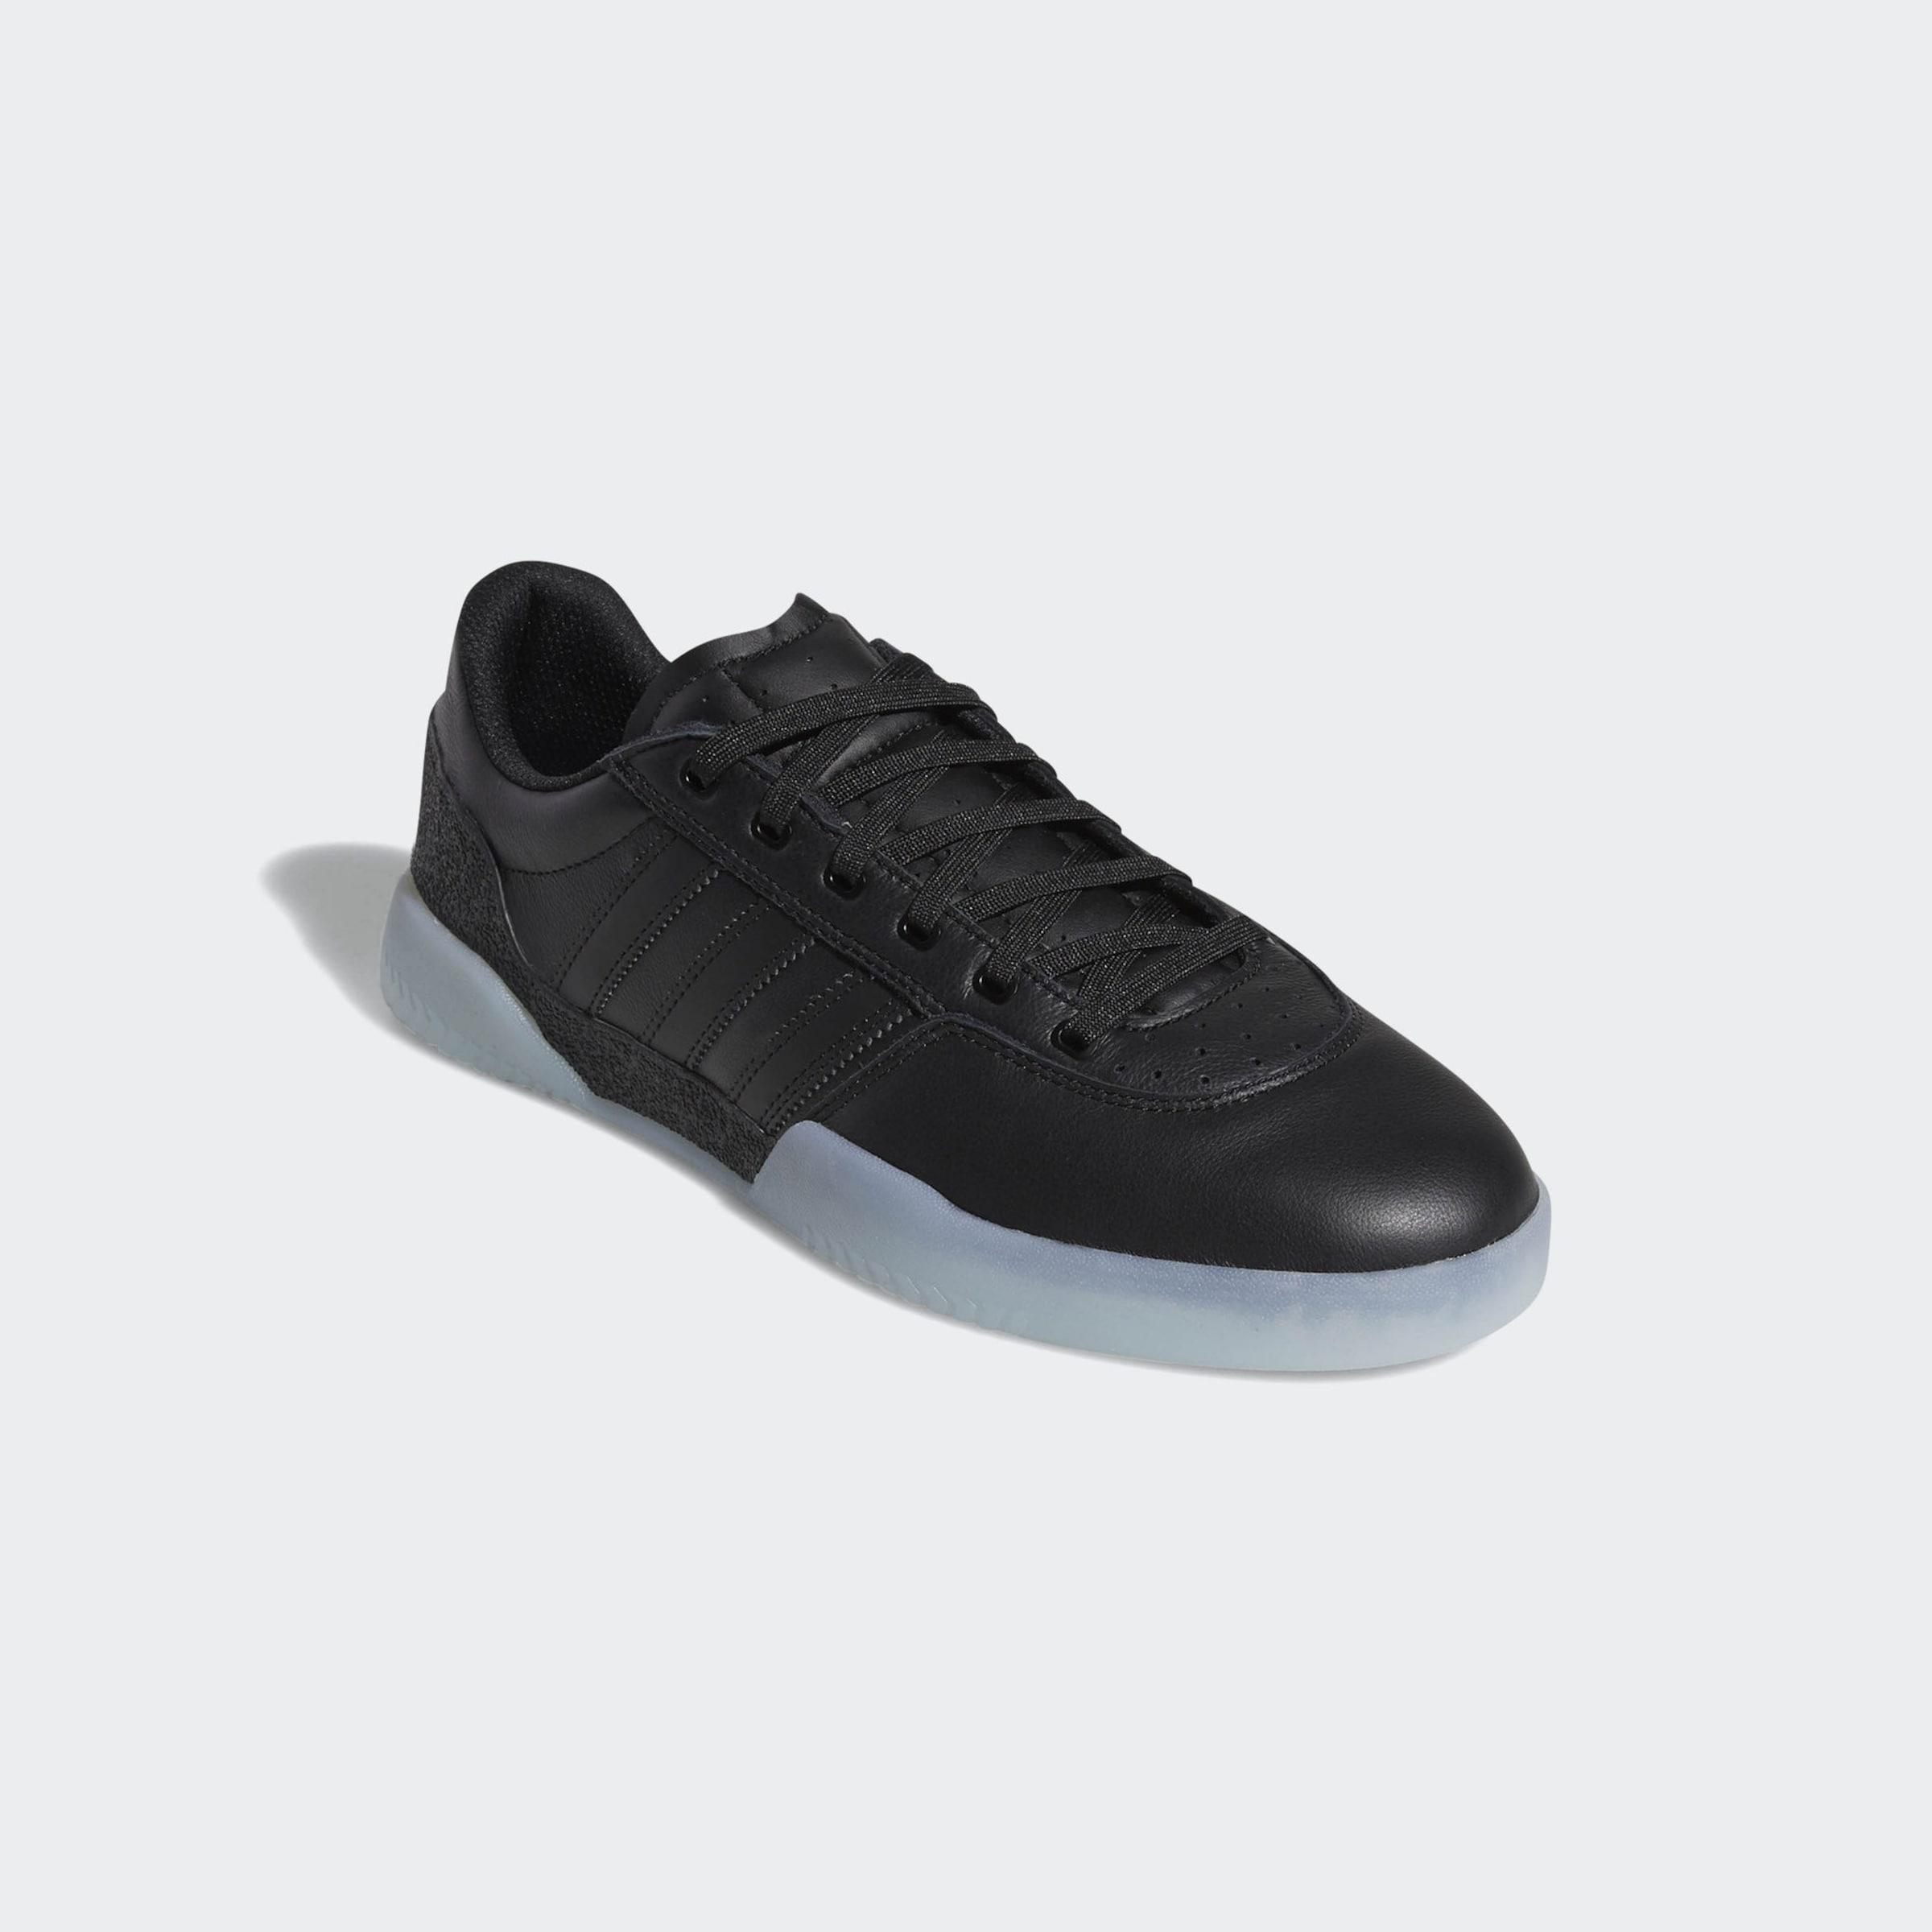 Originals Adidas Originals Schwarz Adidas In Sneaker Sneaker qMSUVzp